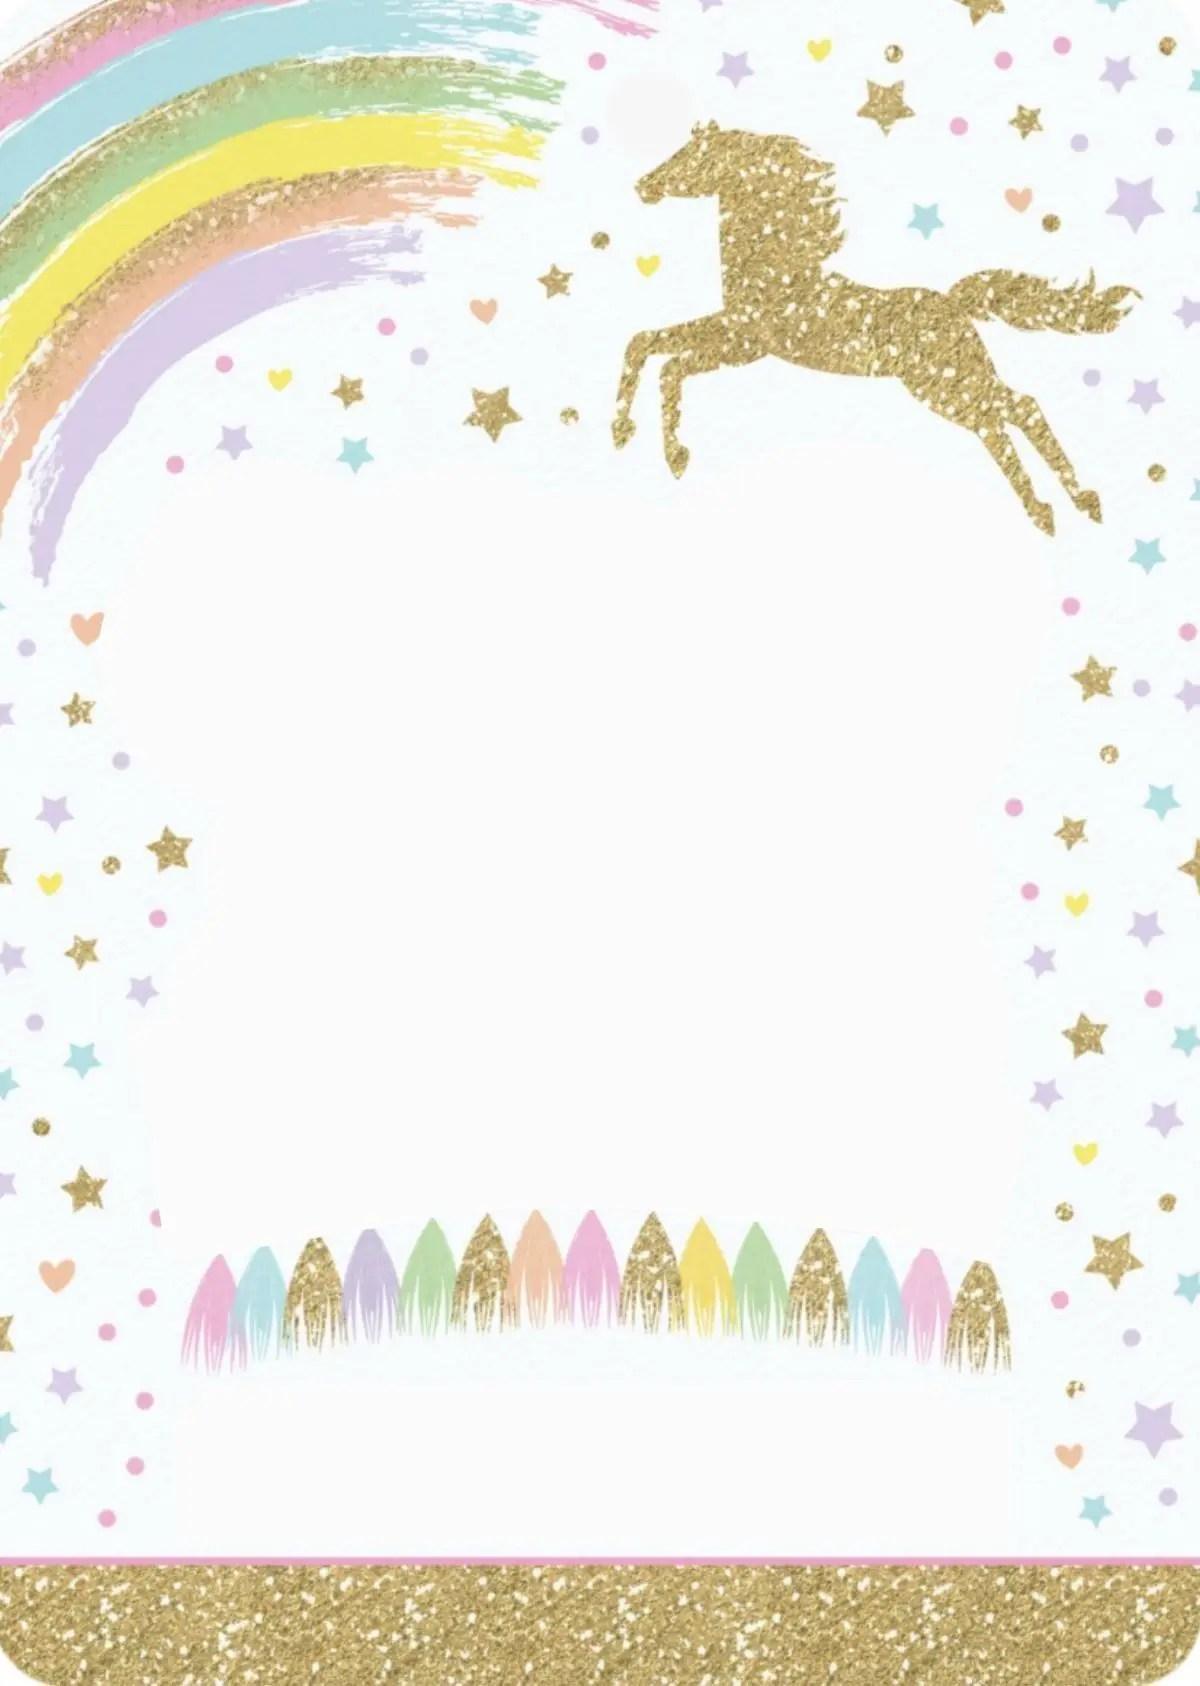 Fulgurant Unicorn Birthday Invitations Printable Magical Unicorn Birthday Invitations Kitty Baby Love Unicorn Birthday Invitations Near Me Unicorn Birthday Invitations Download invitations Unicorn Birthday Invitations